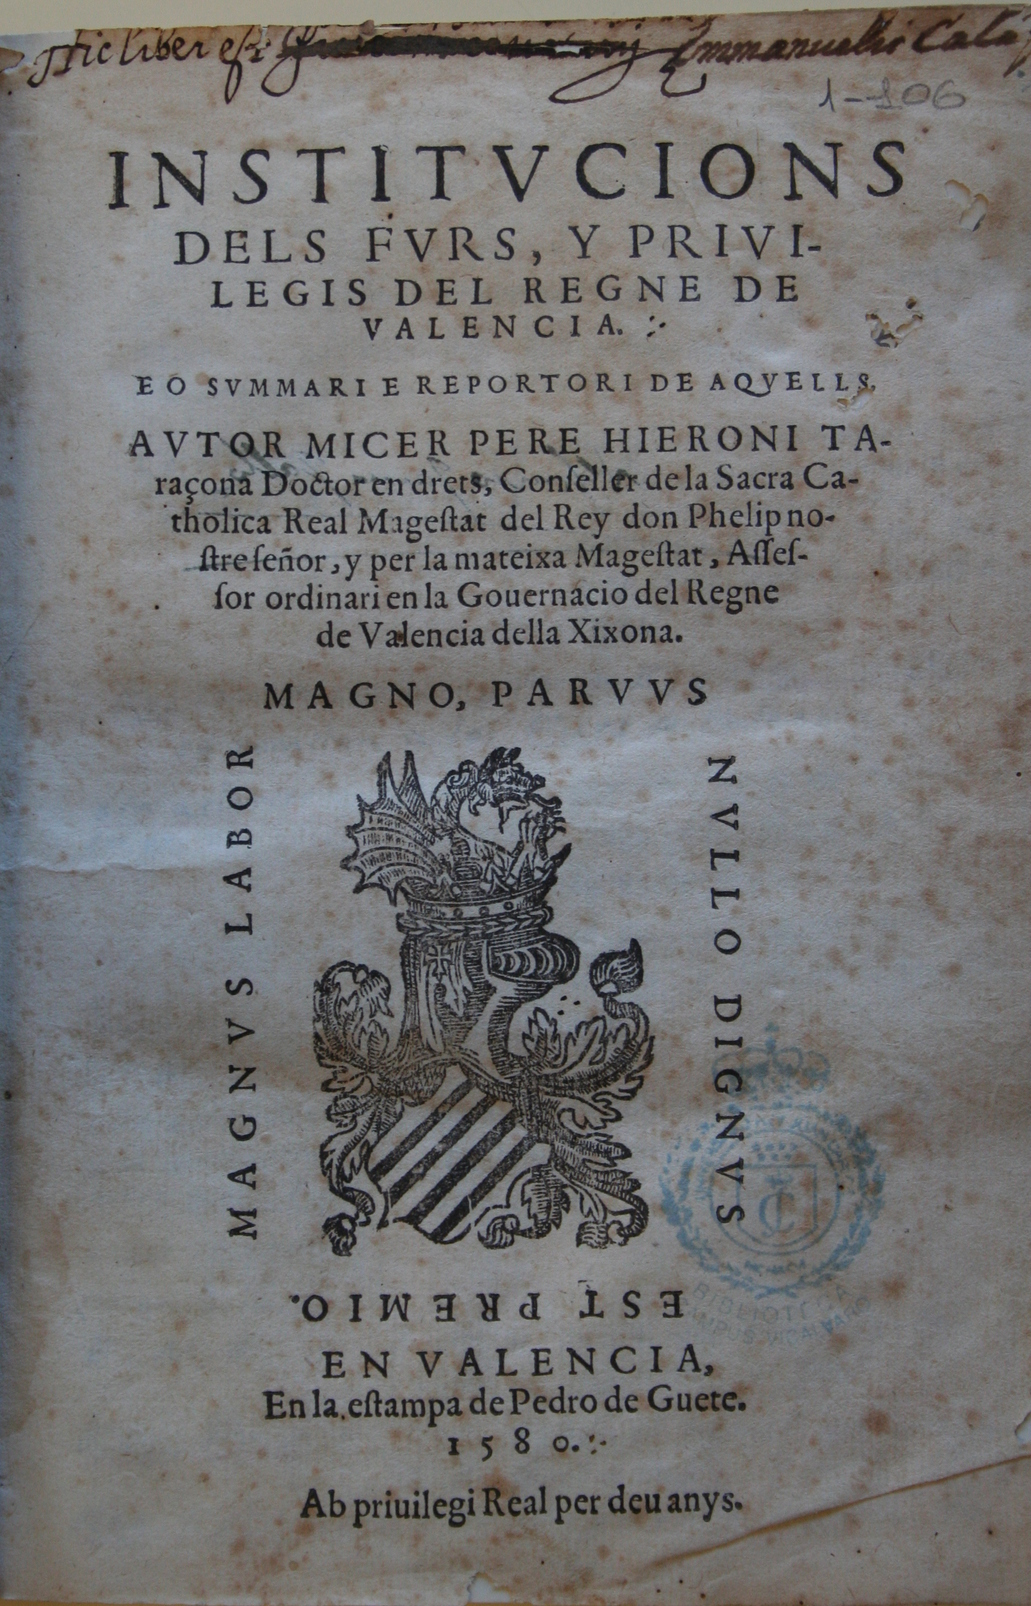 Institucions dels furs y priuilegis del Regno de Valencia, 1580